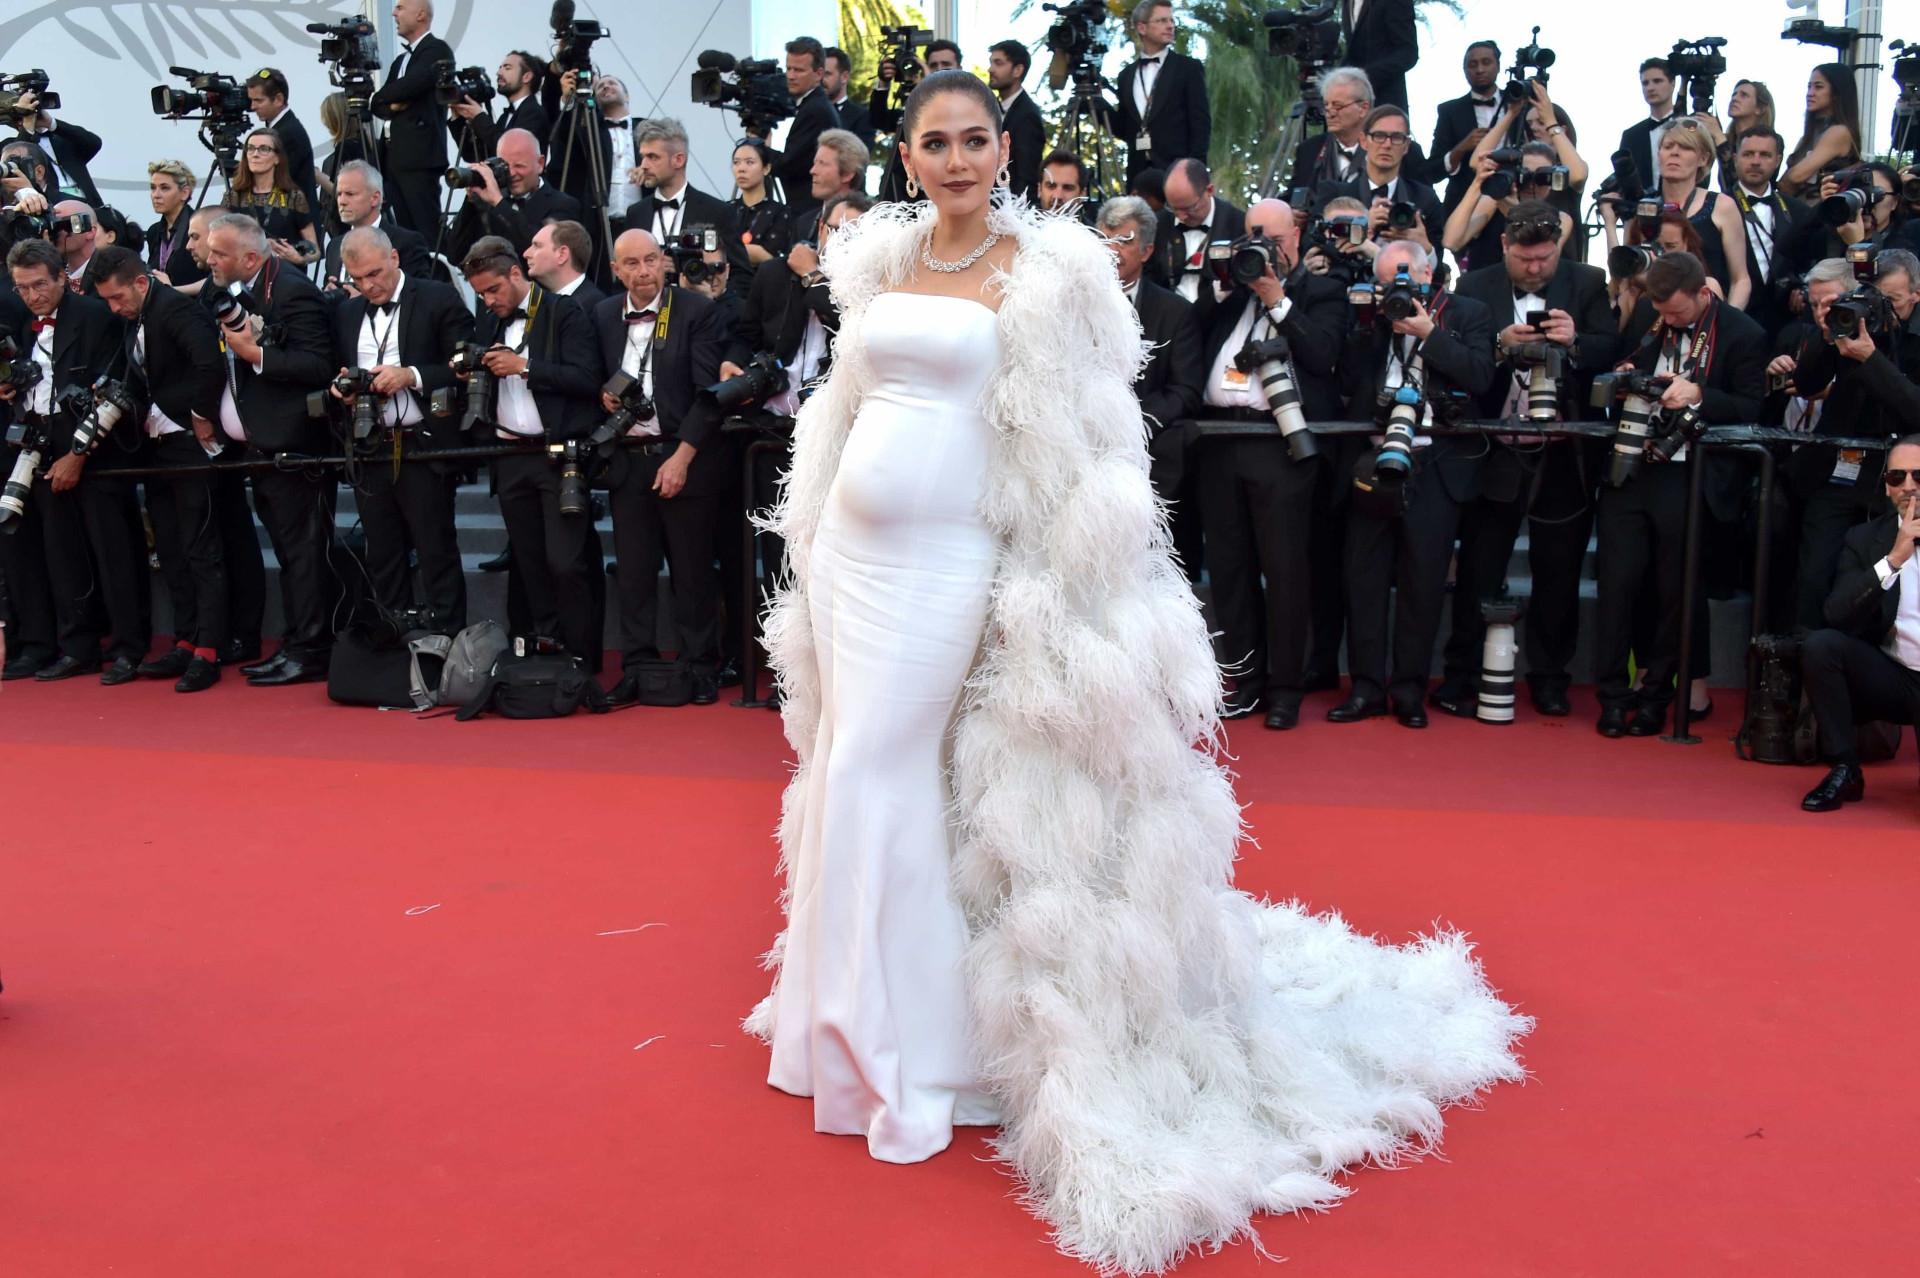 Confira os destaques da abertura do Festival de Cannes 2017